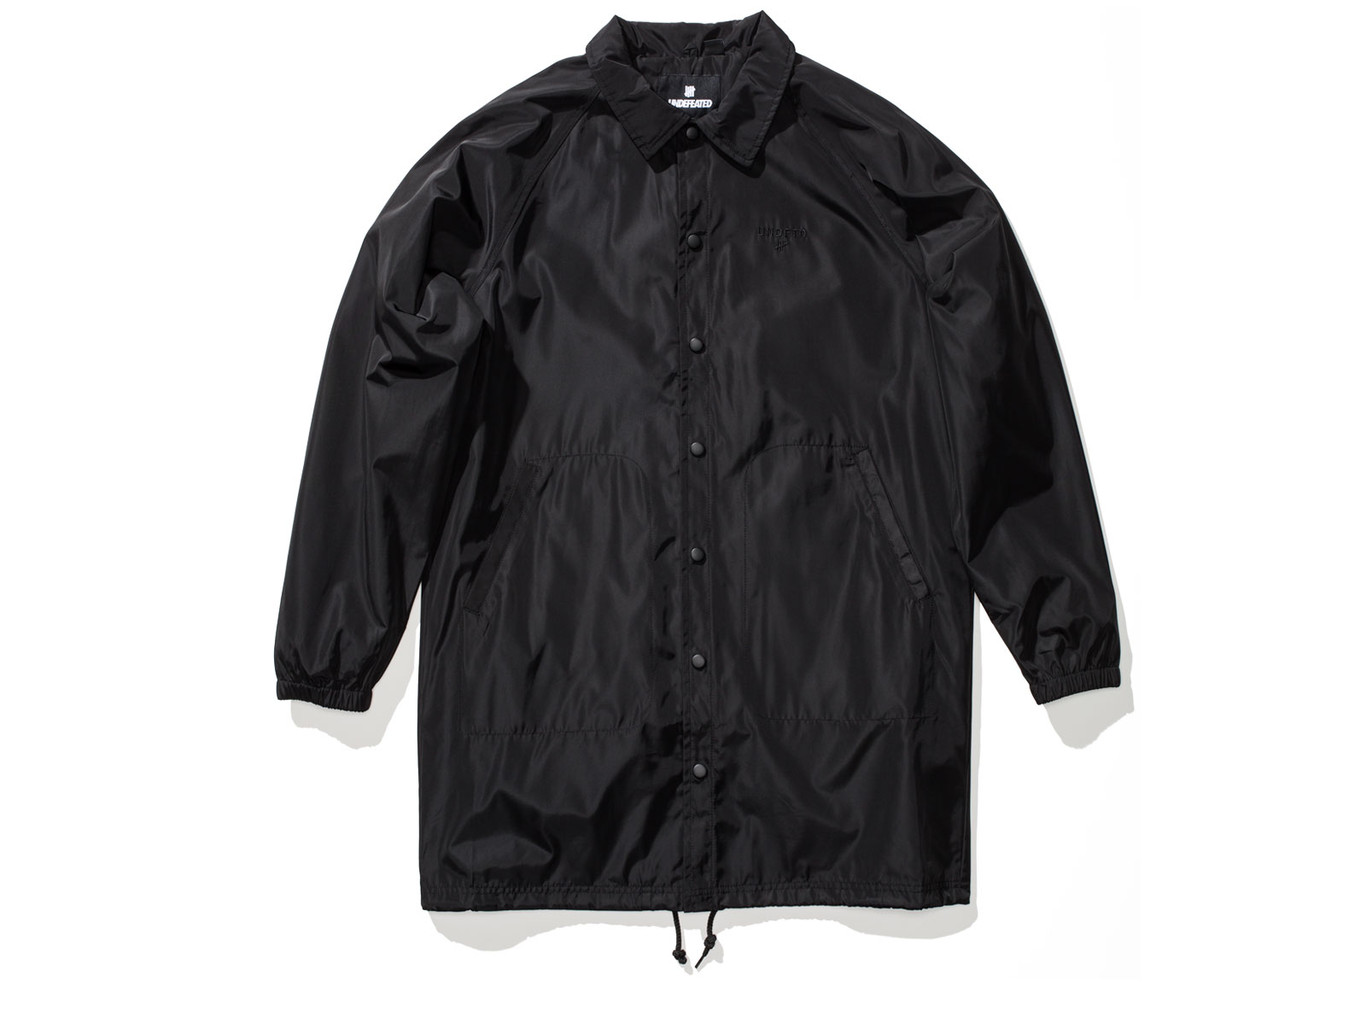 ☆Mr.Sneaker☆ Undefeated 3RD Quarter Jacket 長版 大衣 防風 風衣 外套 教練外套 黑、綠 兩色